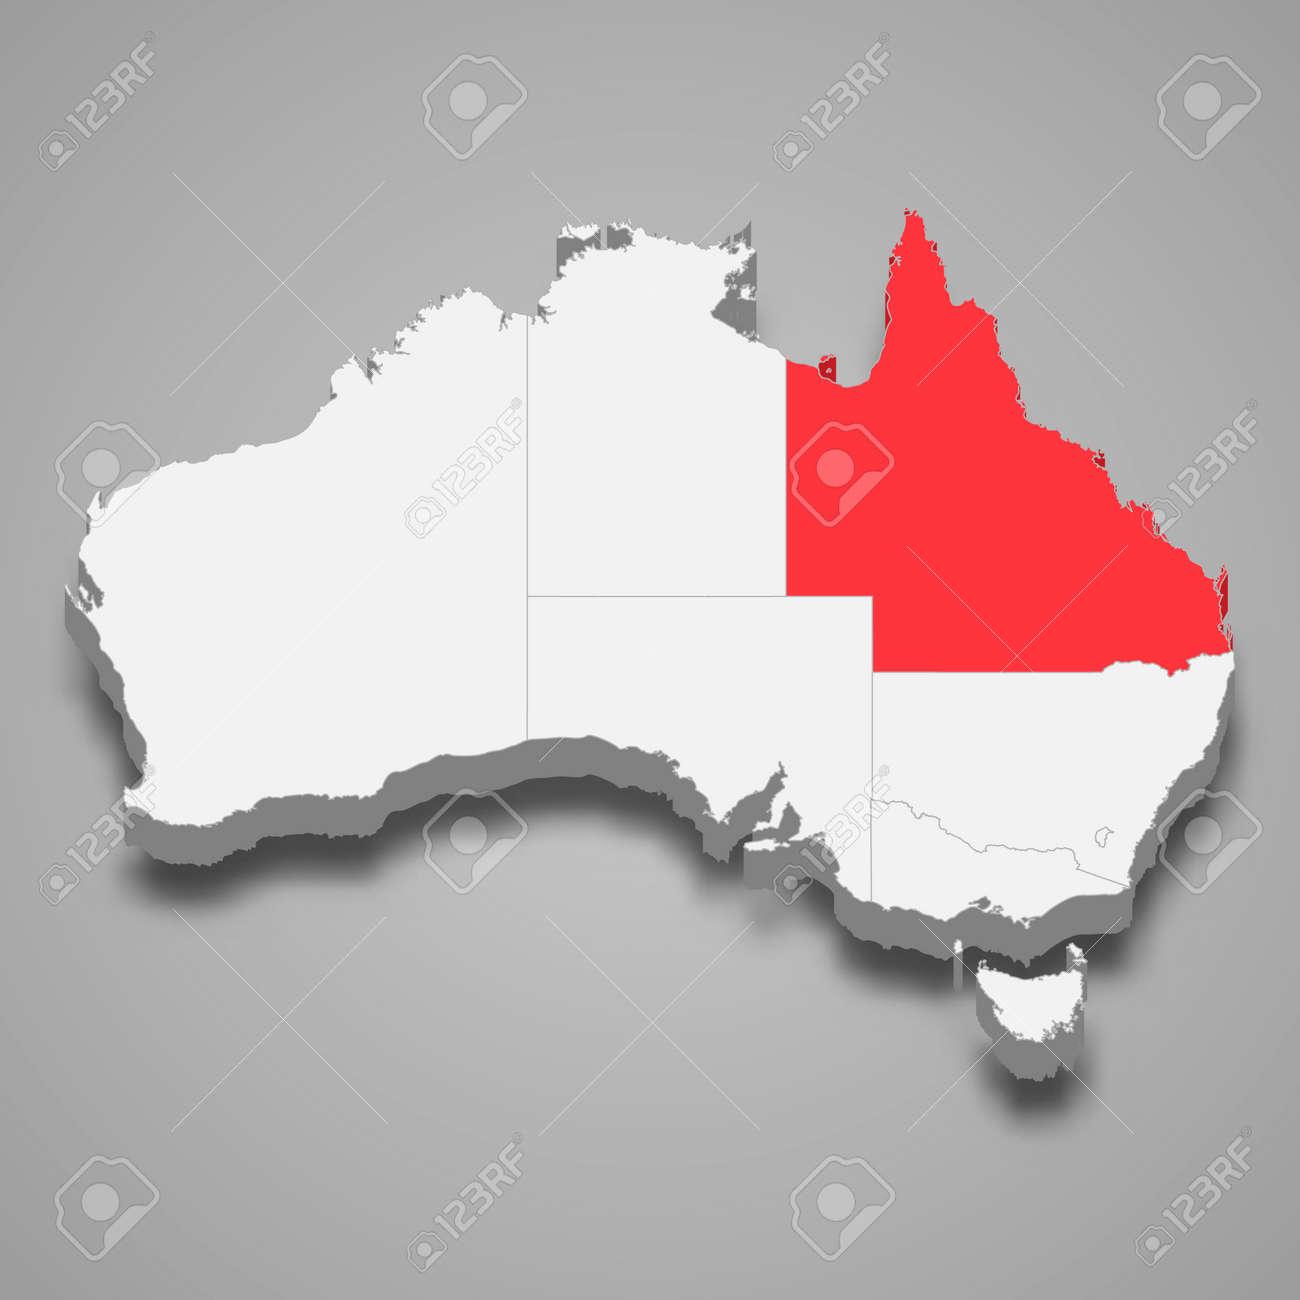 Queensland region location within Australia 3d isometric map - 168929065